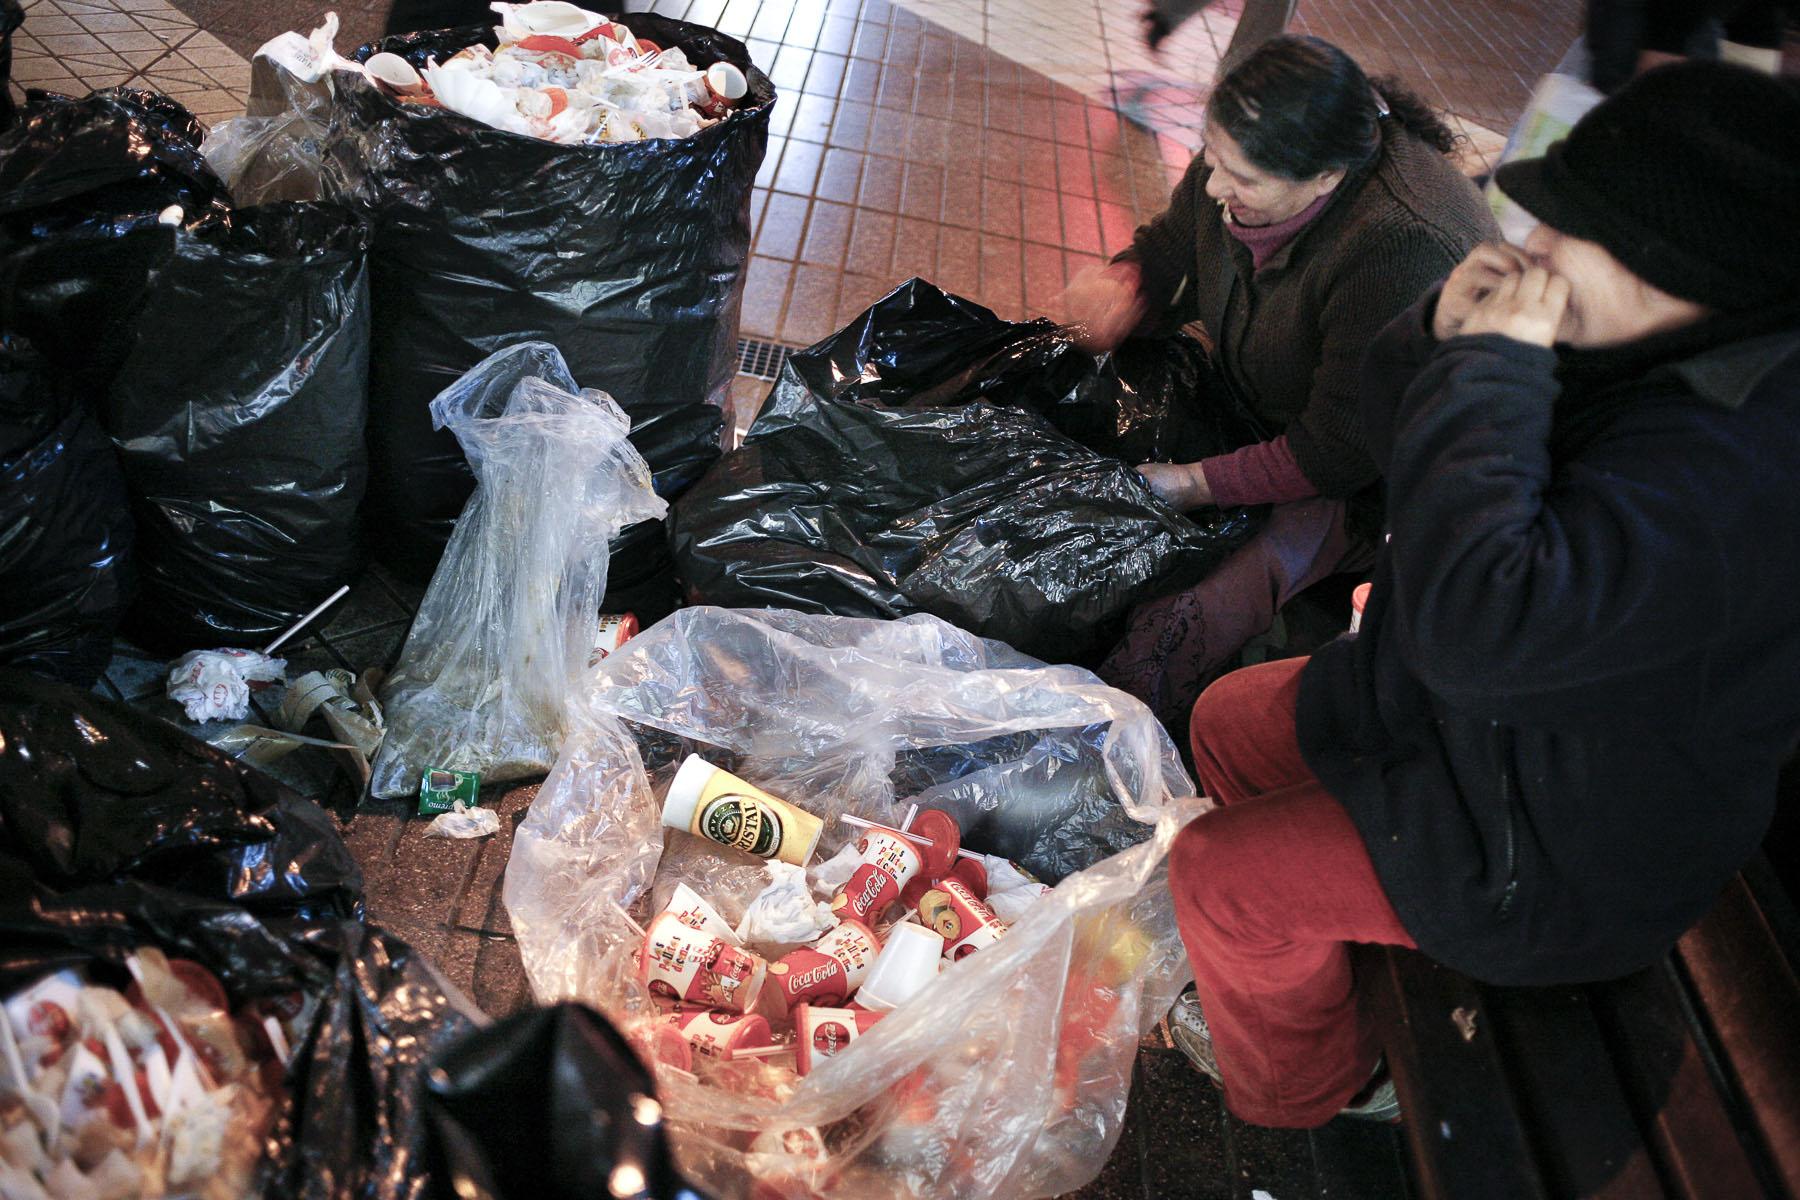 Near the Plaza de Armas, two women eat from a fast-food  rubbish bin in September 2007